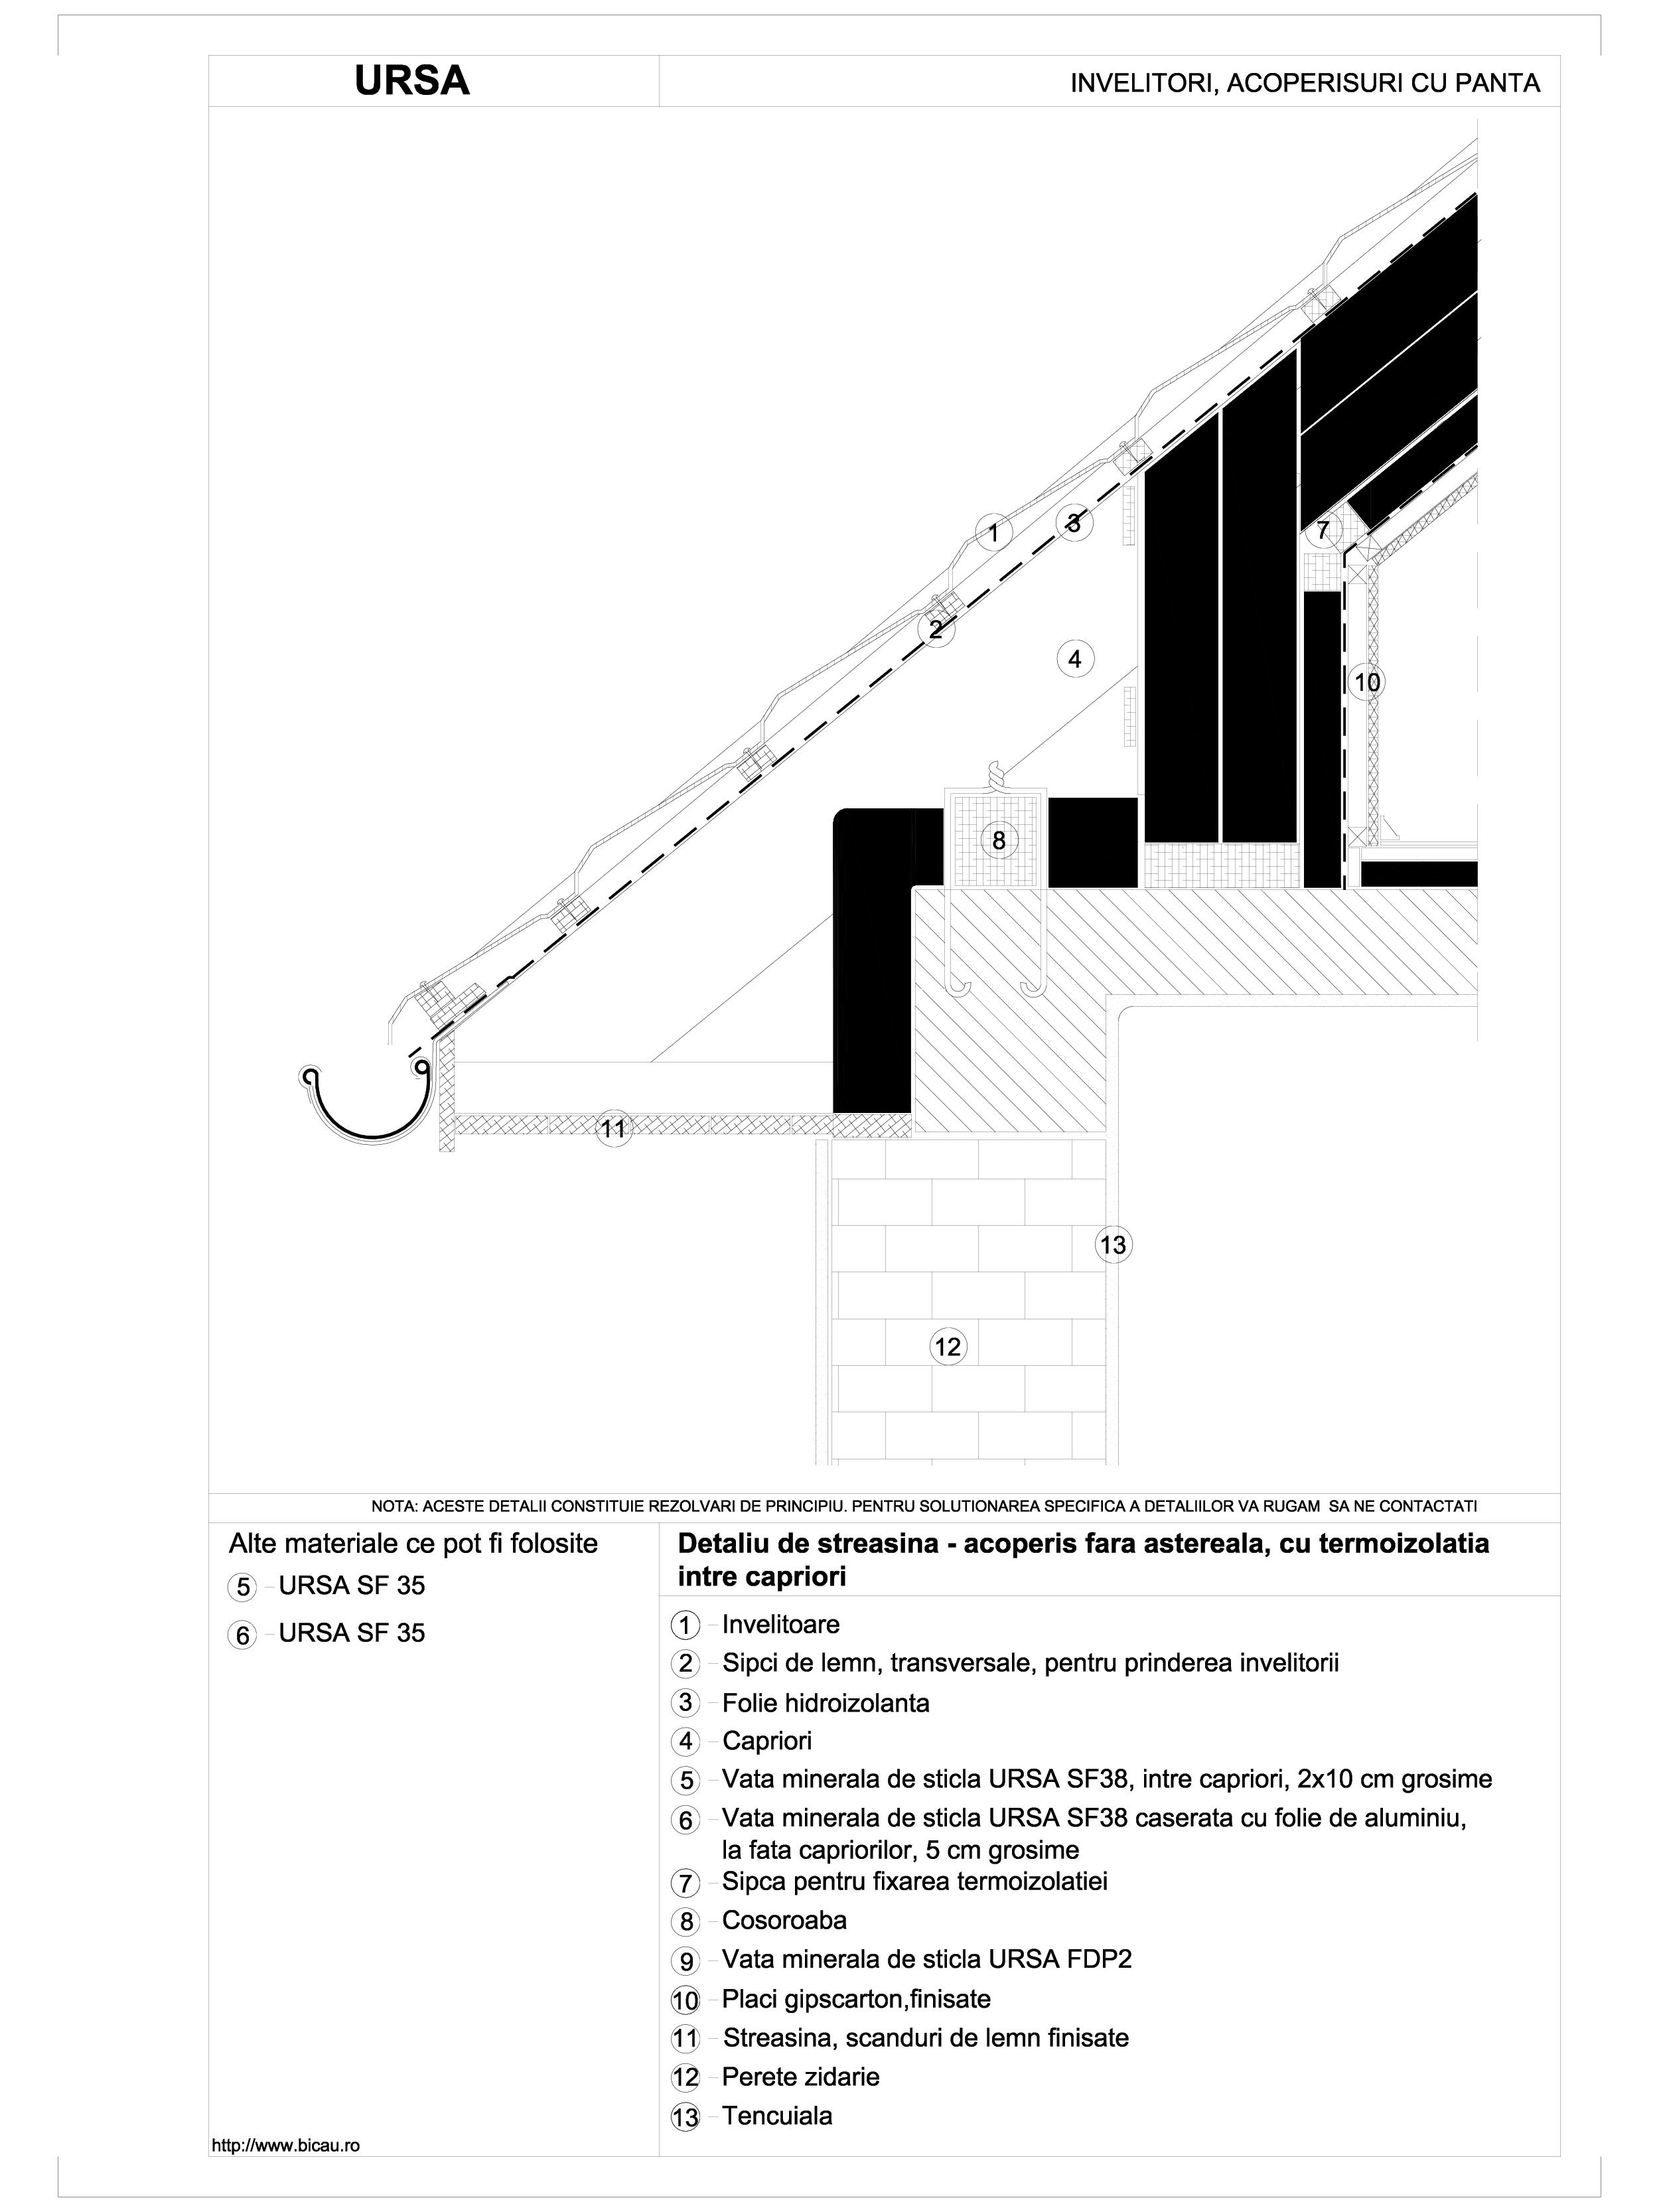 Detaliu de streasina - acoperis fara astereala, cu termoizolatia intre capriori URSA Vata minerala pentru acoperisuri si mansarde URSA ROMANIA   - Pagina 1